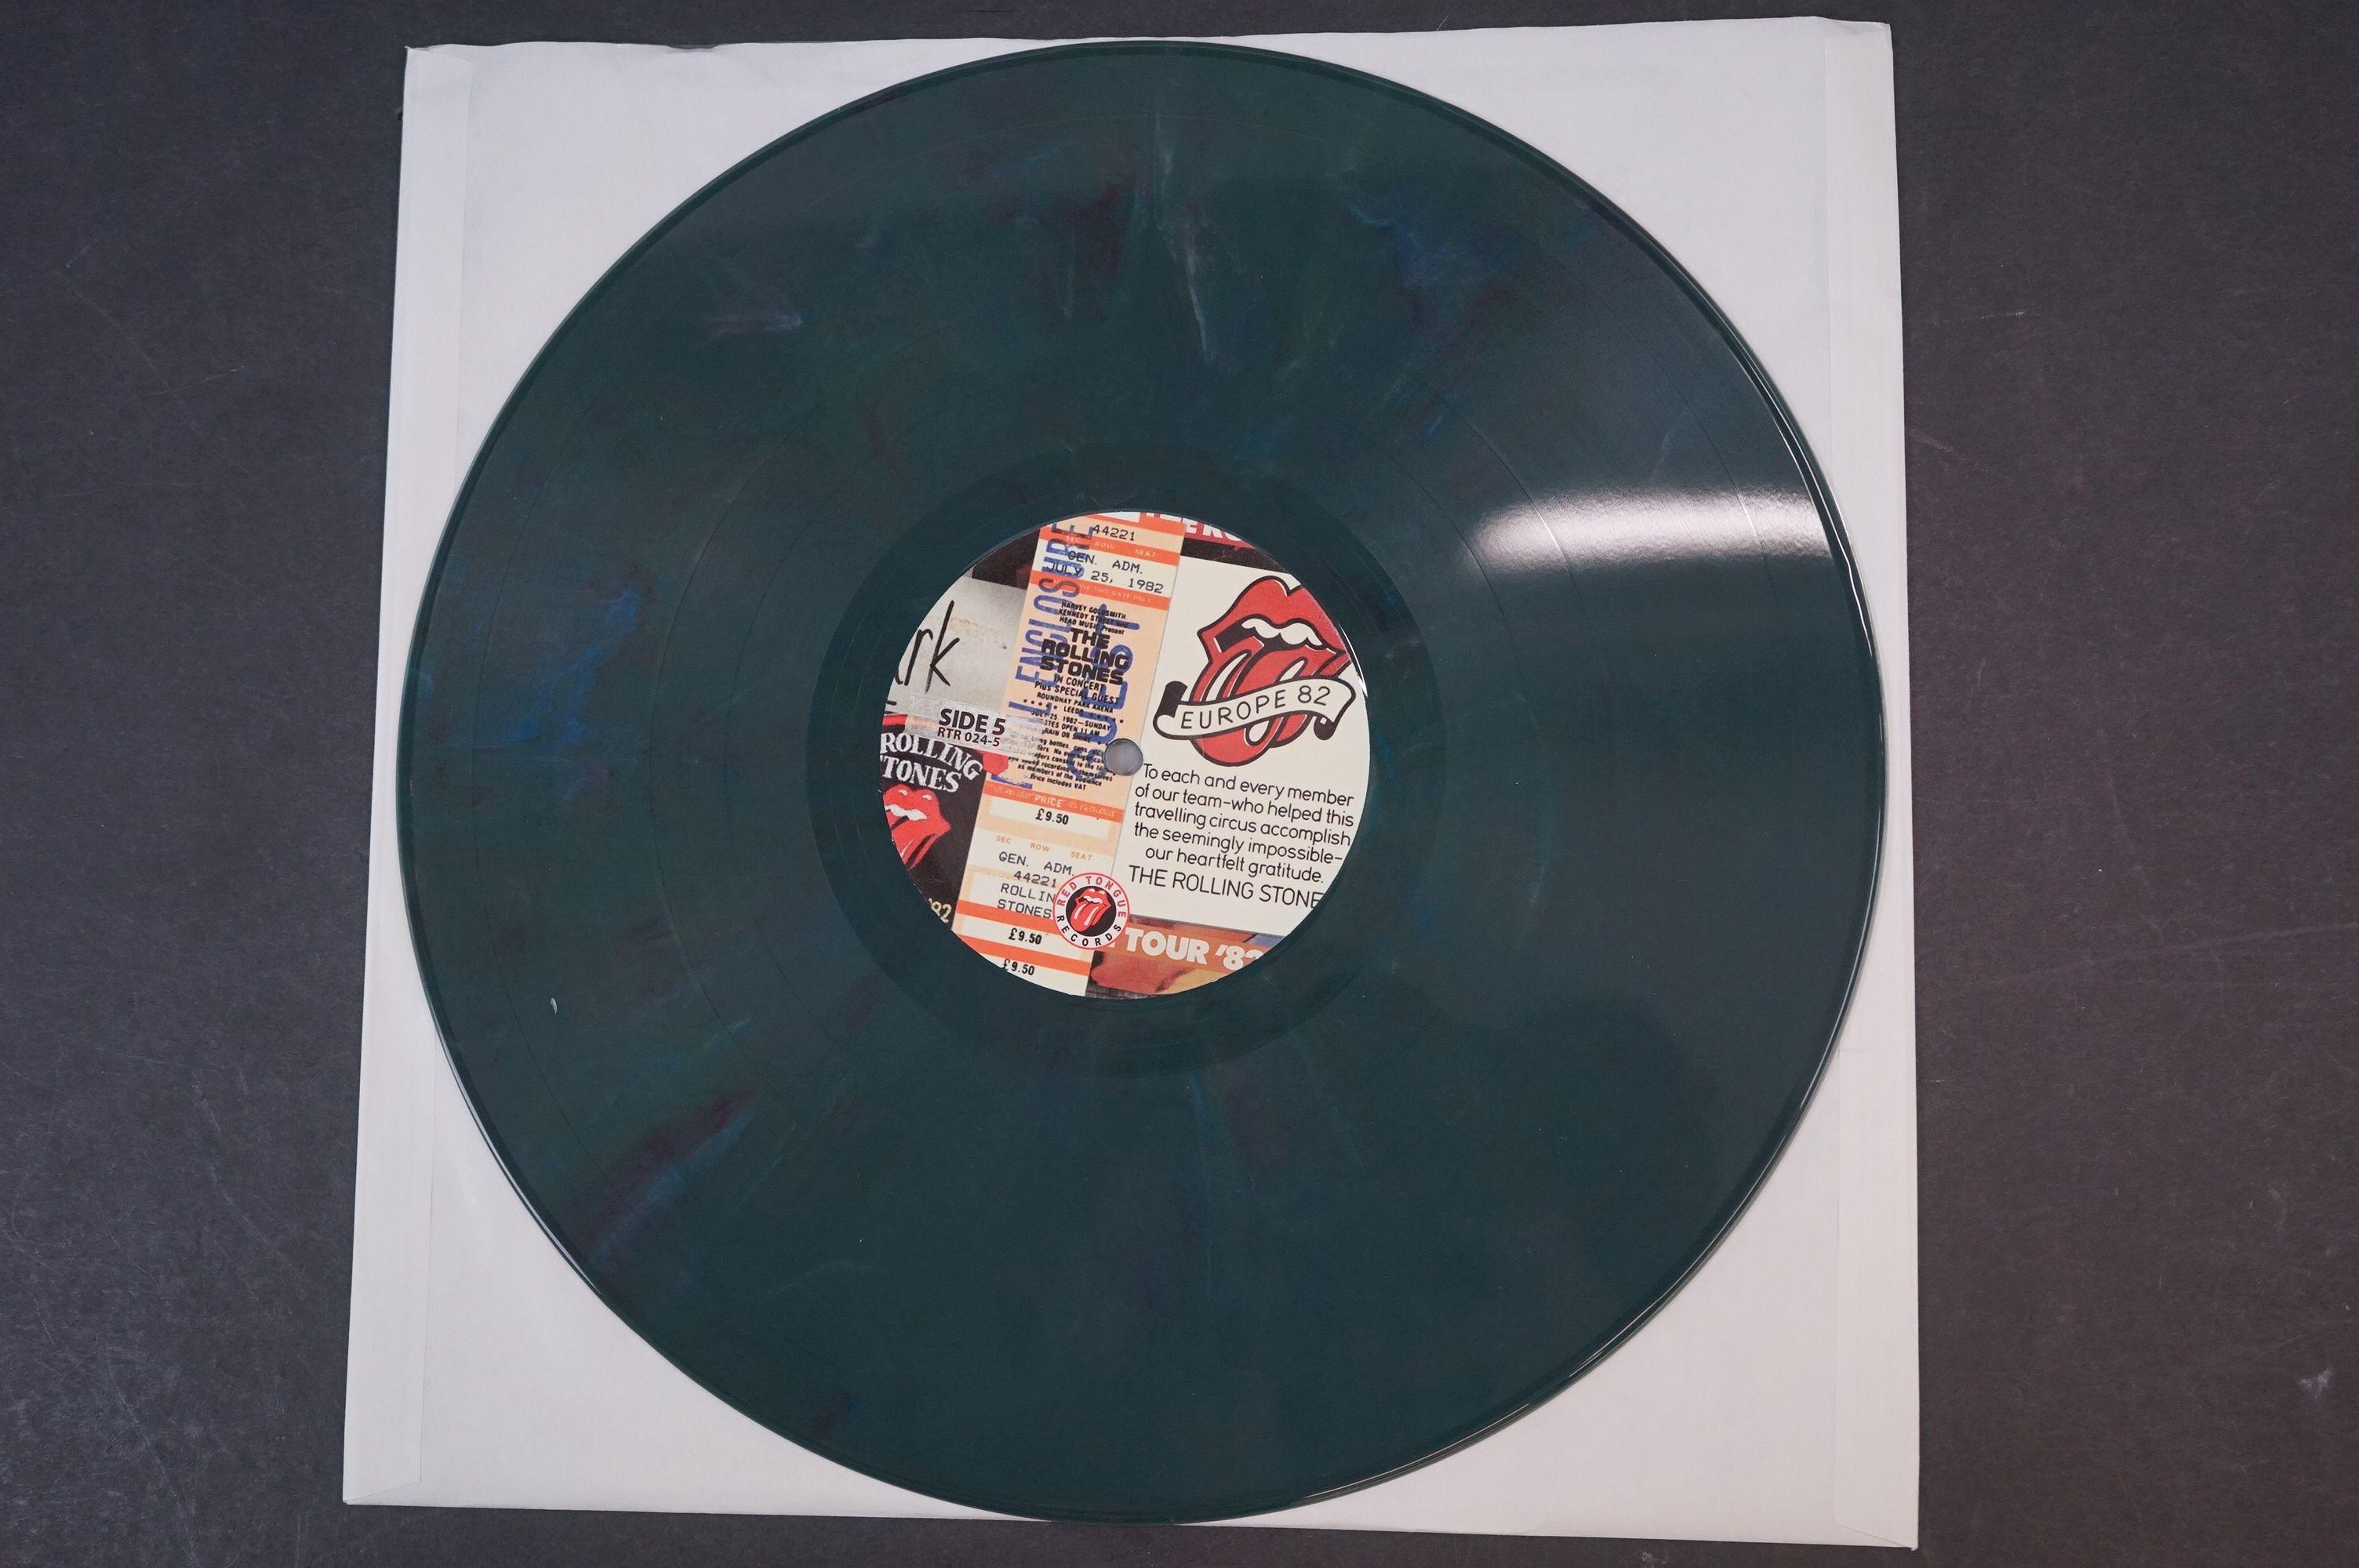 Vinyl - ltd edn The Real Alternate Album Rolling Stones Leeds July 25 1982 3 LP / 2 CD Box Set RTR - Image 7 of 10